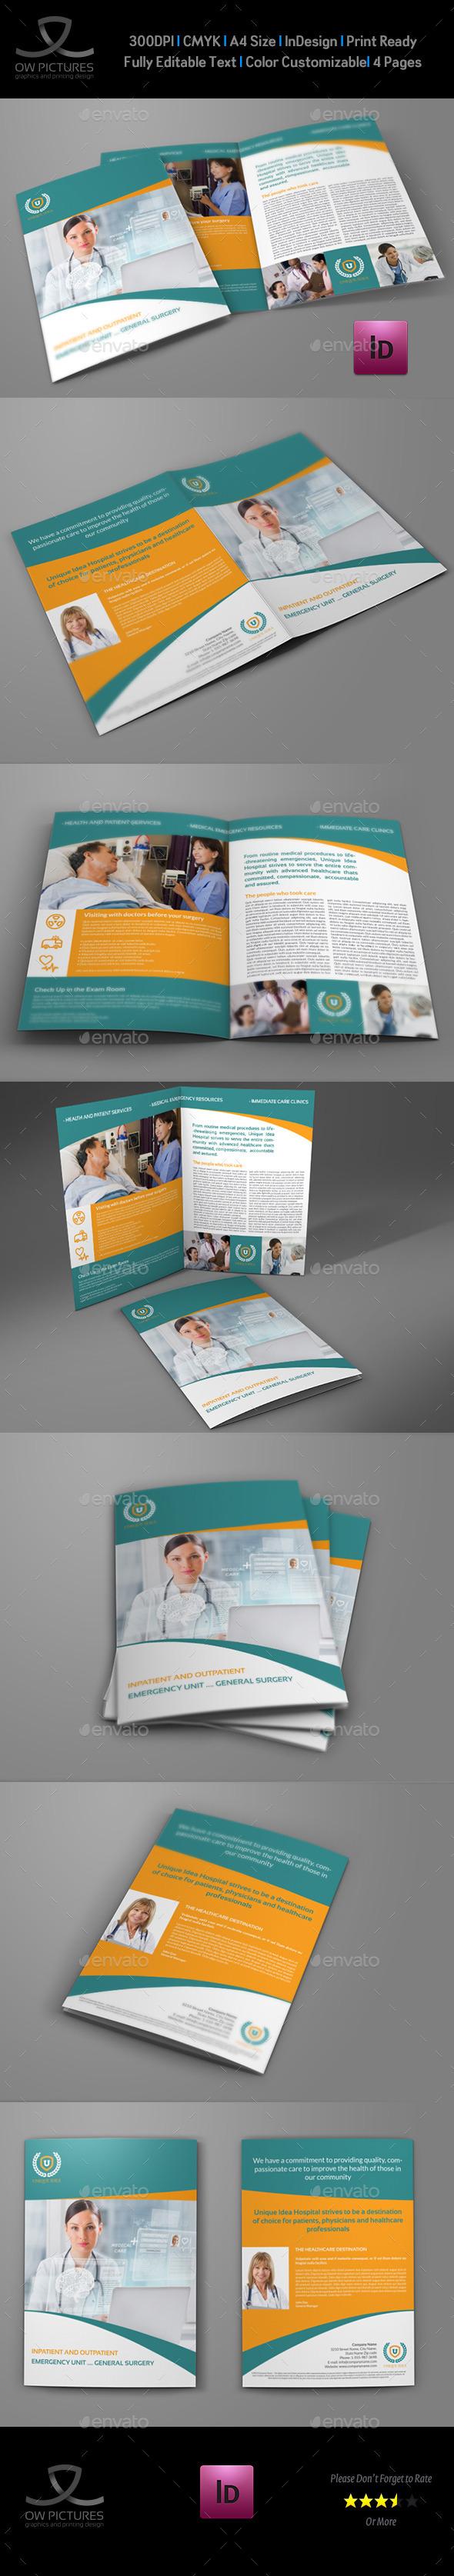 GraphicRiver Hospital Bi-Fold Brochure Template Vol.2 9334242